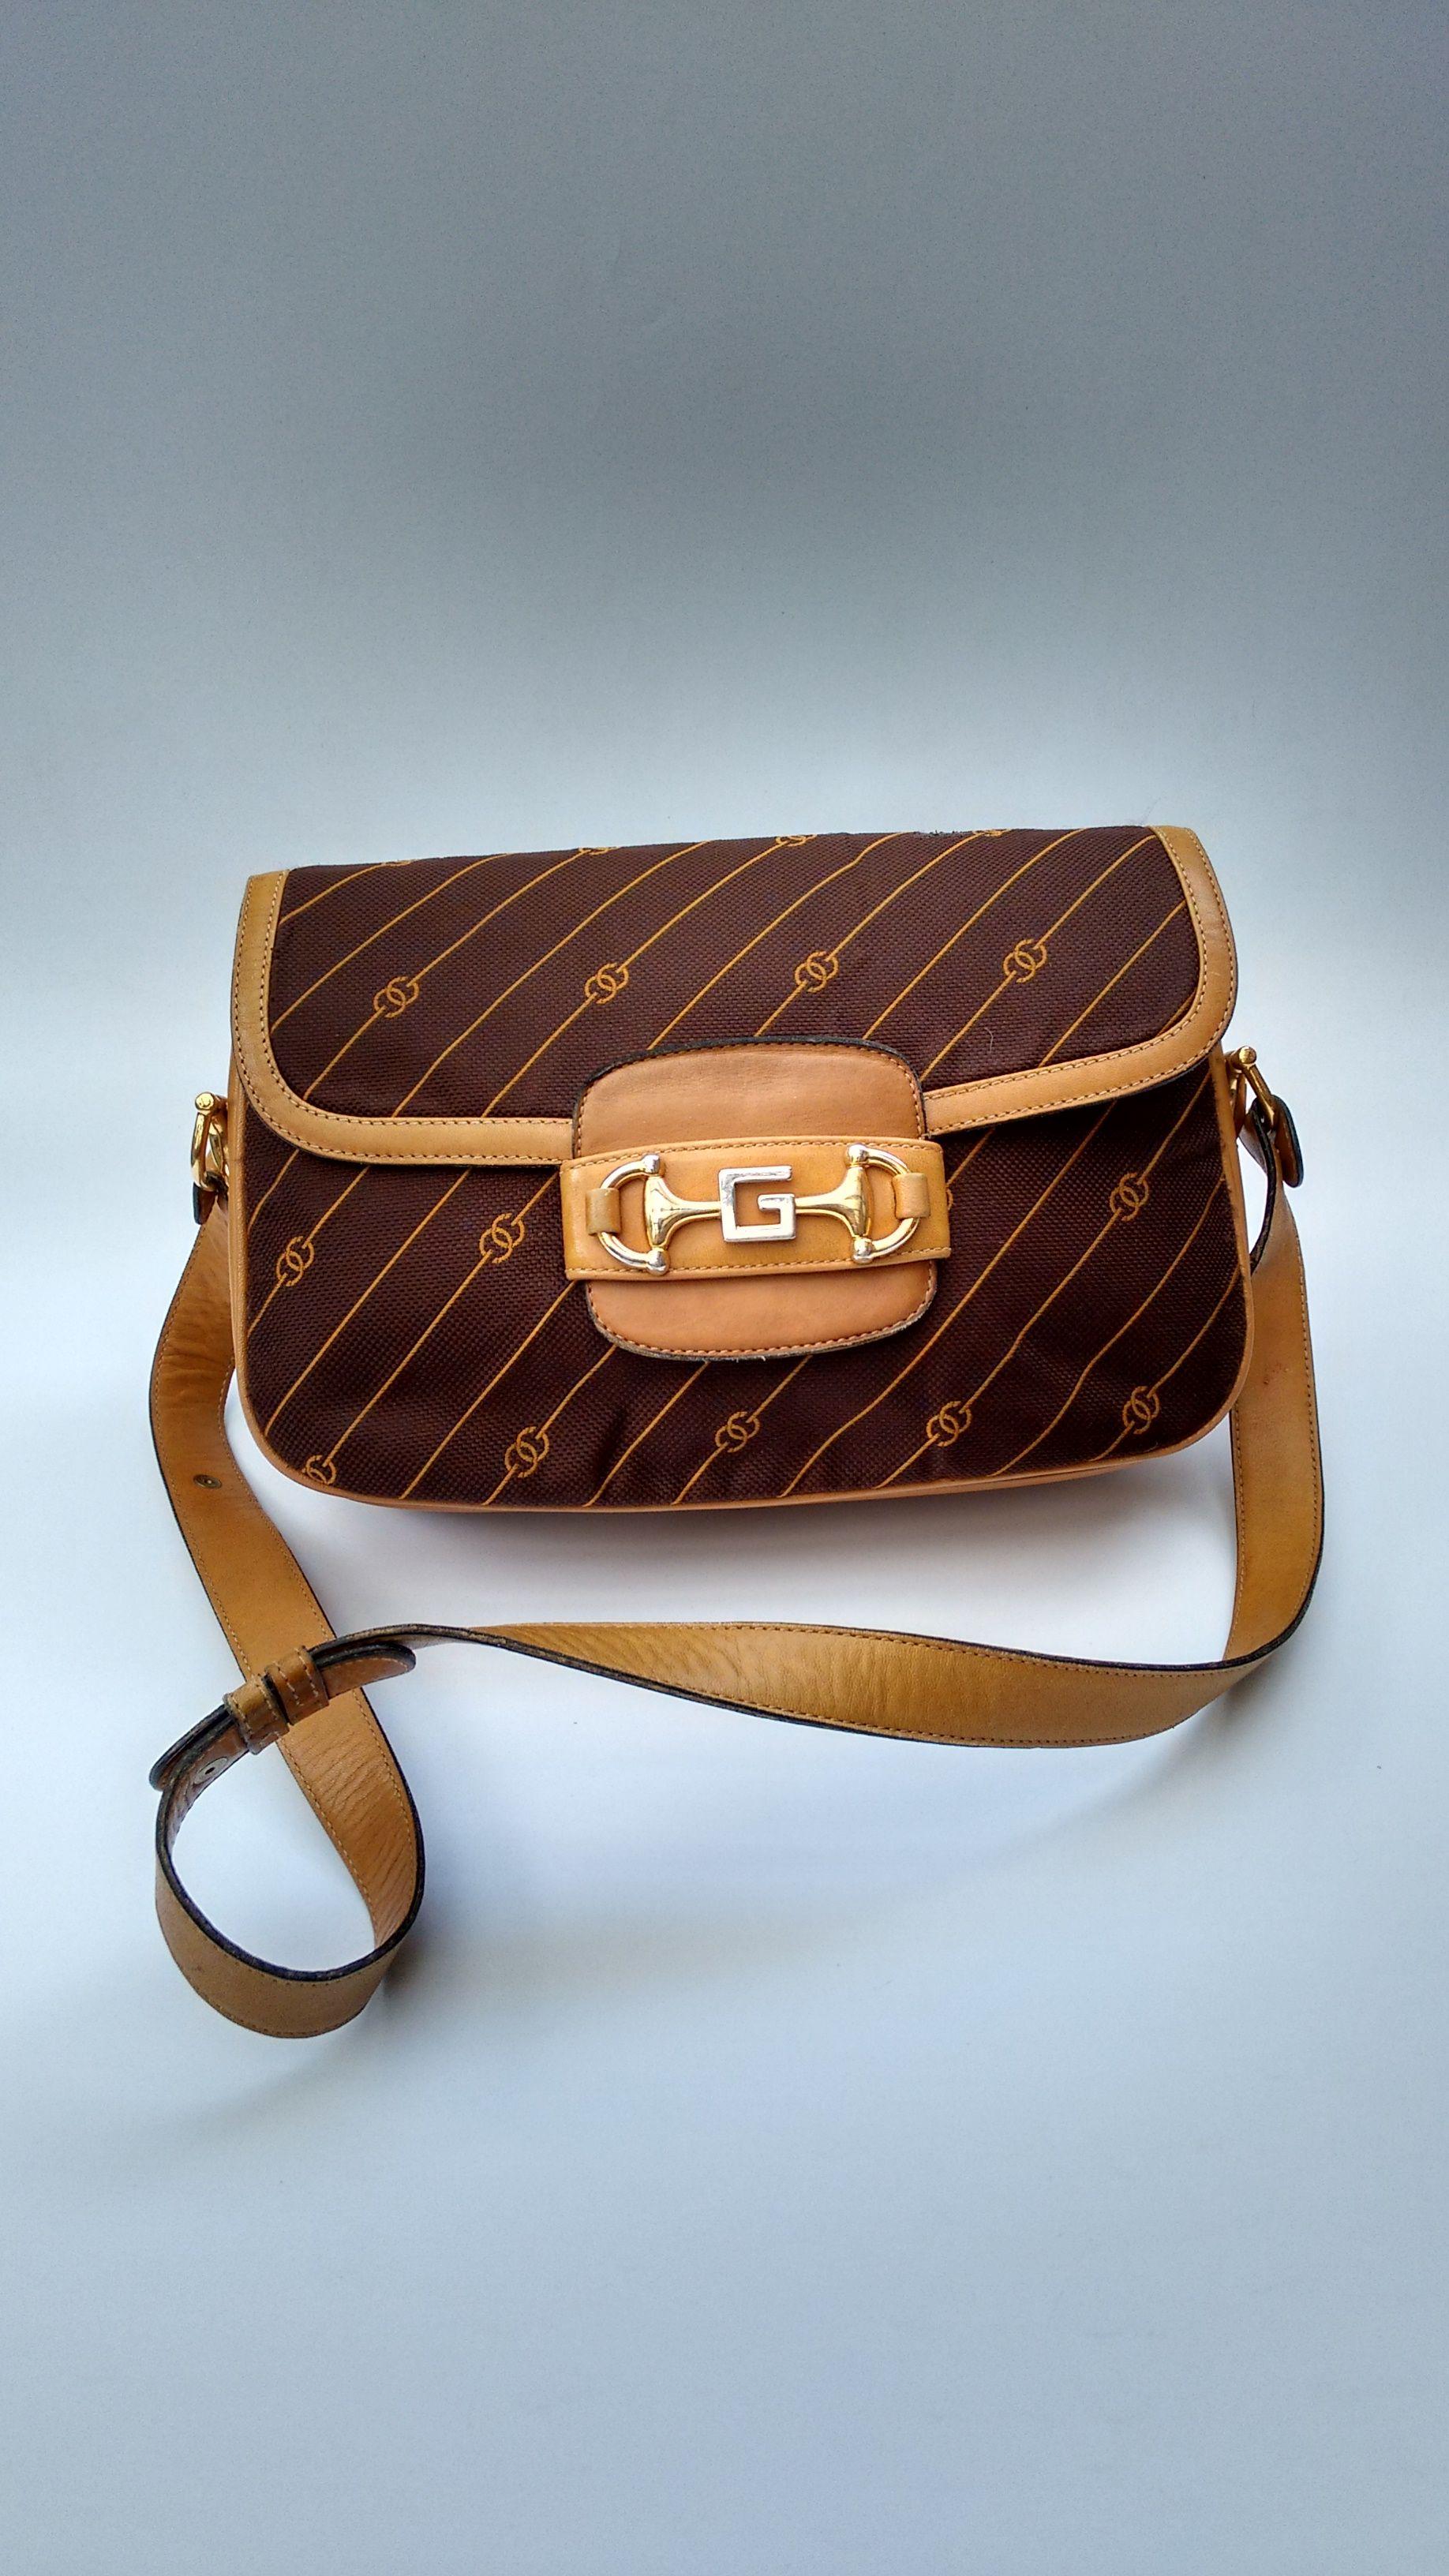 d579e351991 GUCCI Bag. Gucci Vintage Tan Brown Leather Shoulder Bag. Italian Designer  Purse.